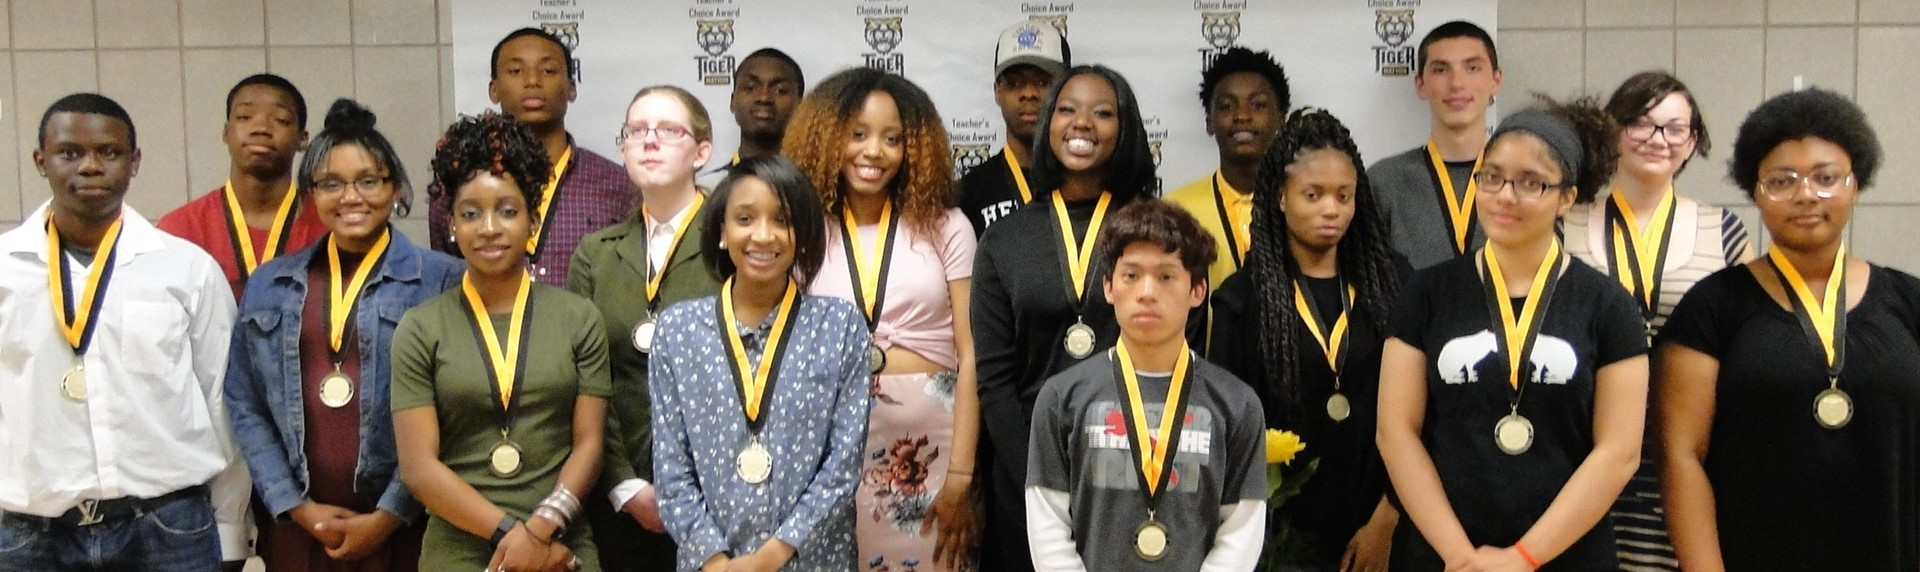 Teacher's Choice Award recipients